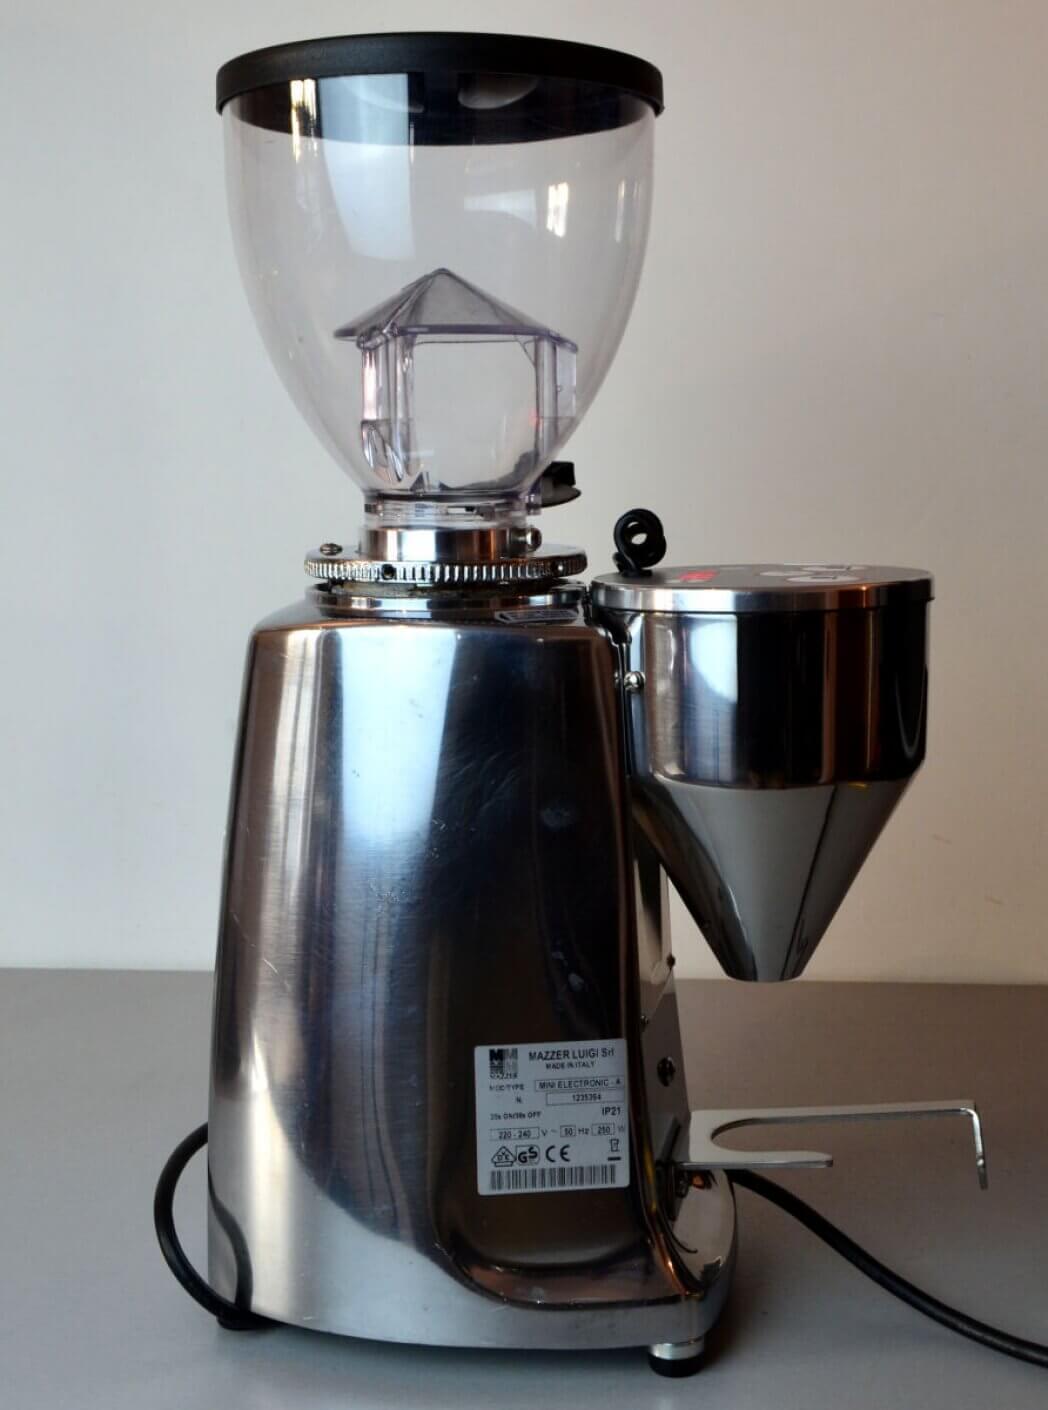 mazzer mini electronique a moulin a cafe  6